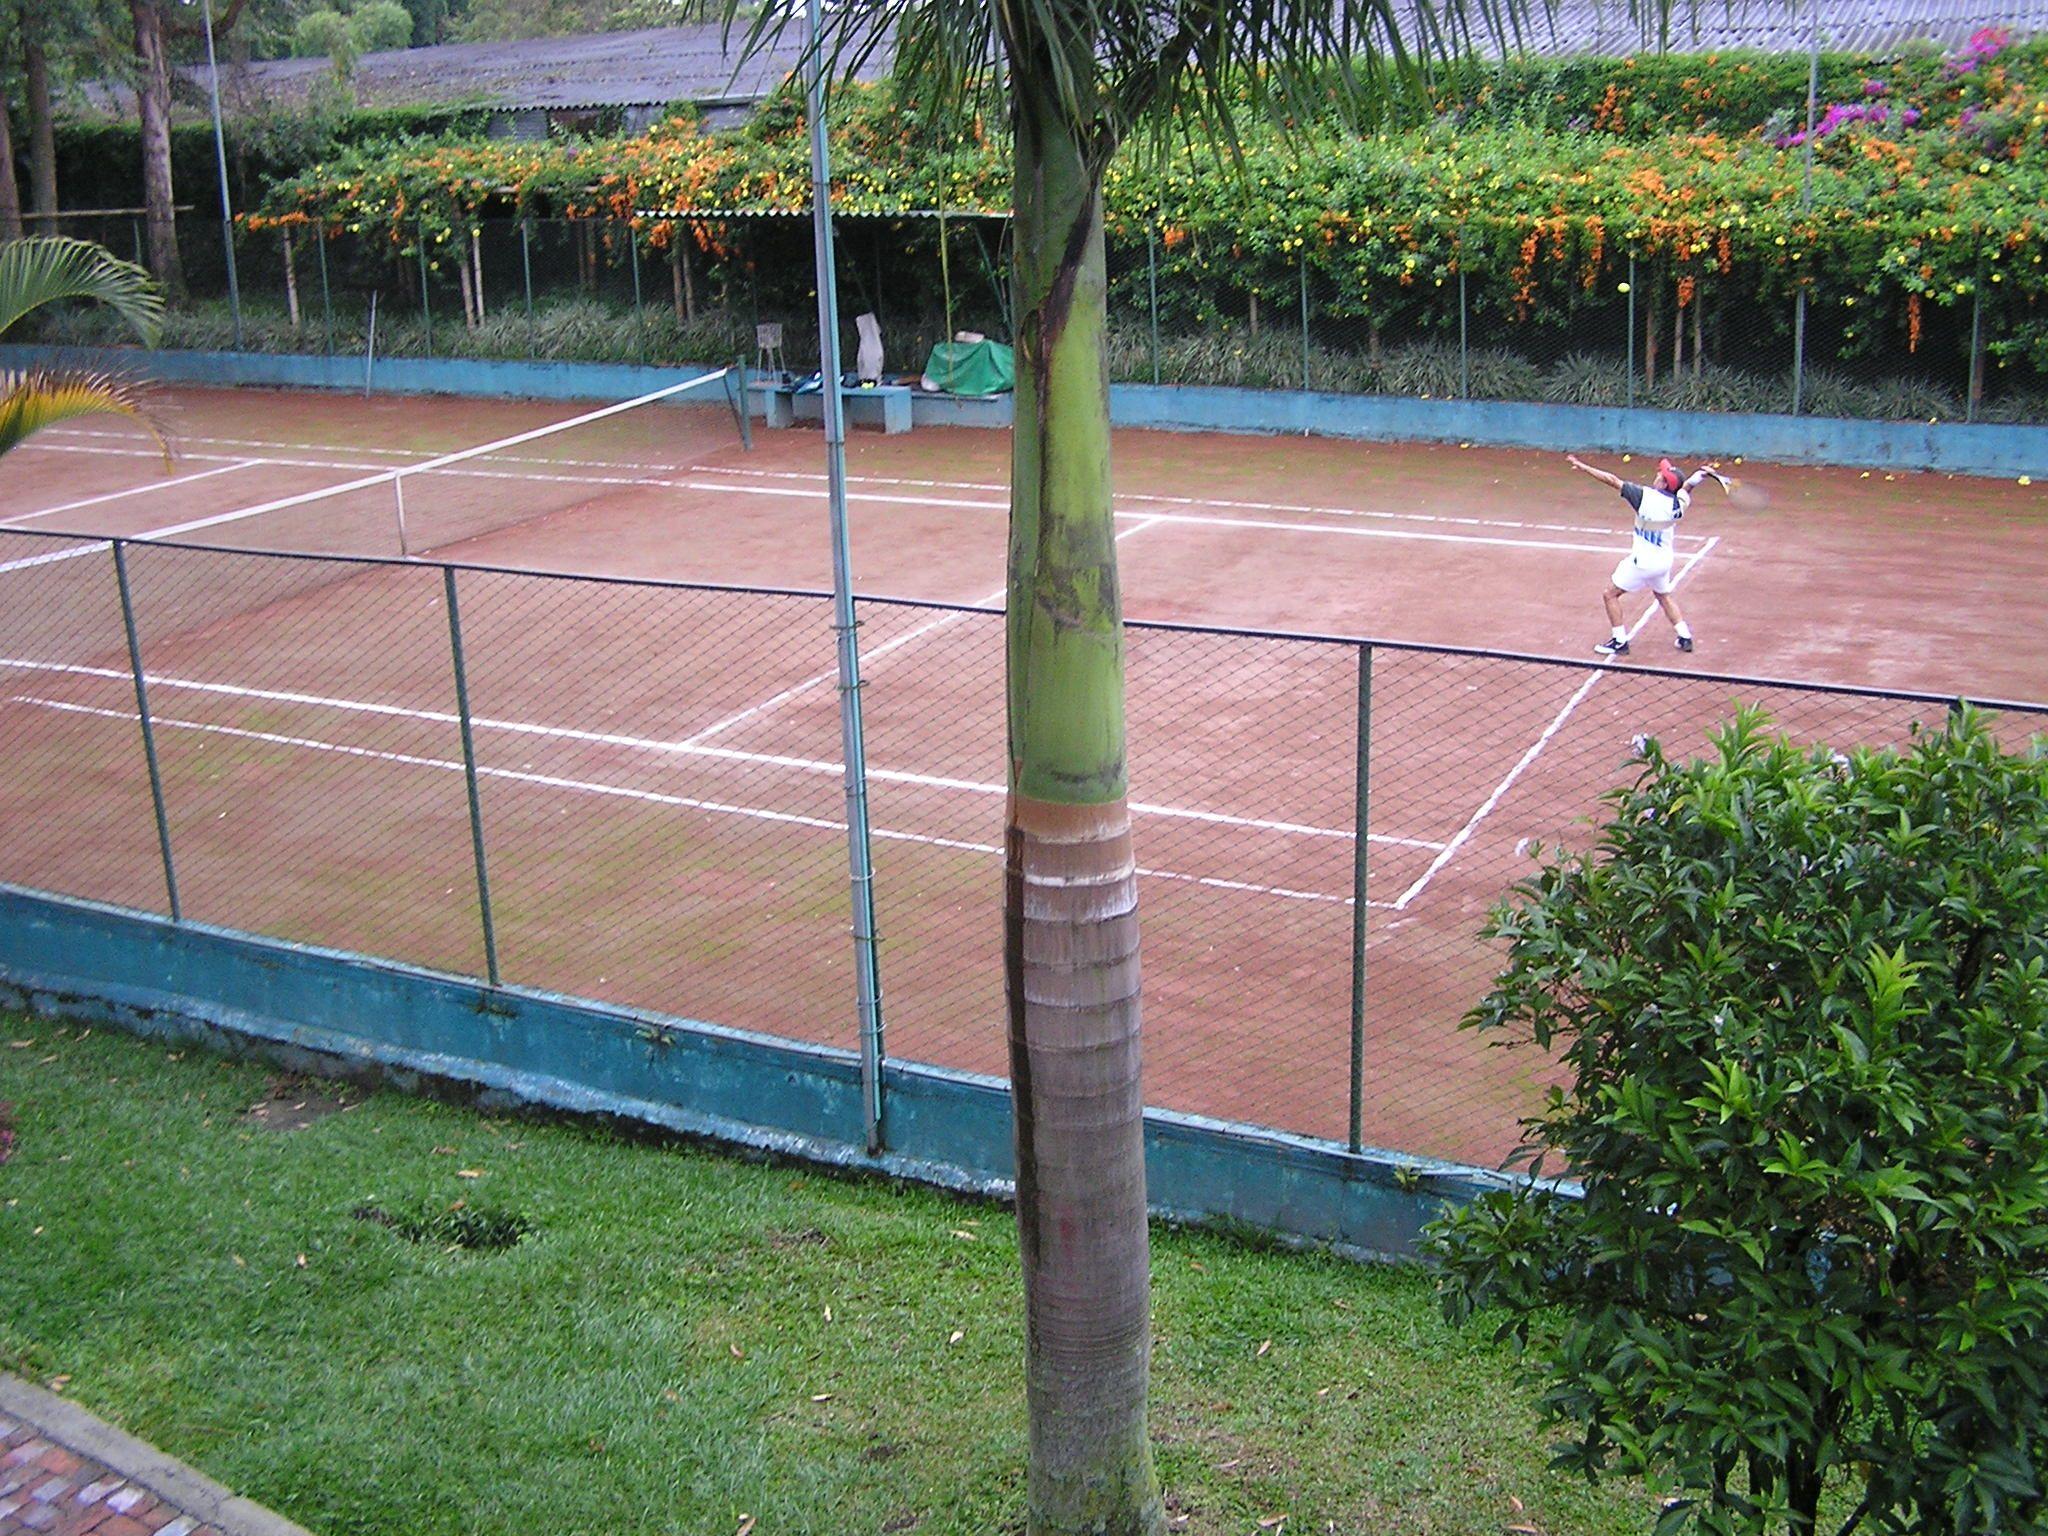 Cacha de Tenis